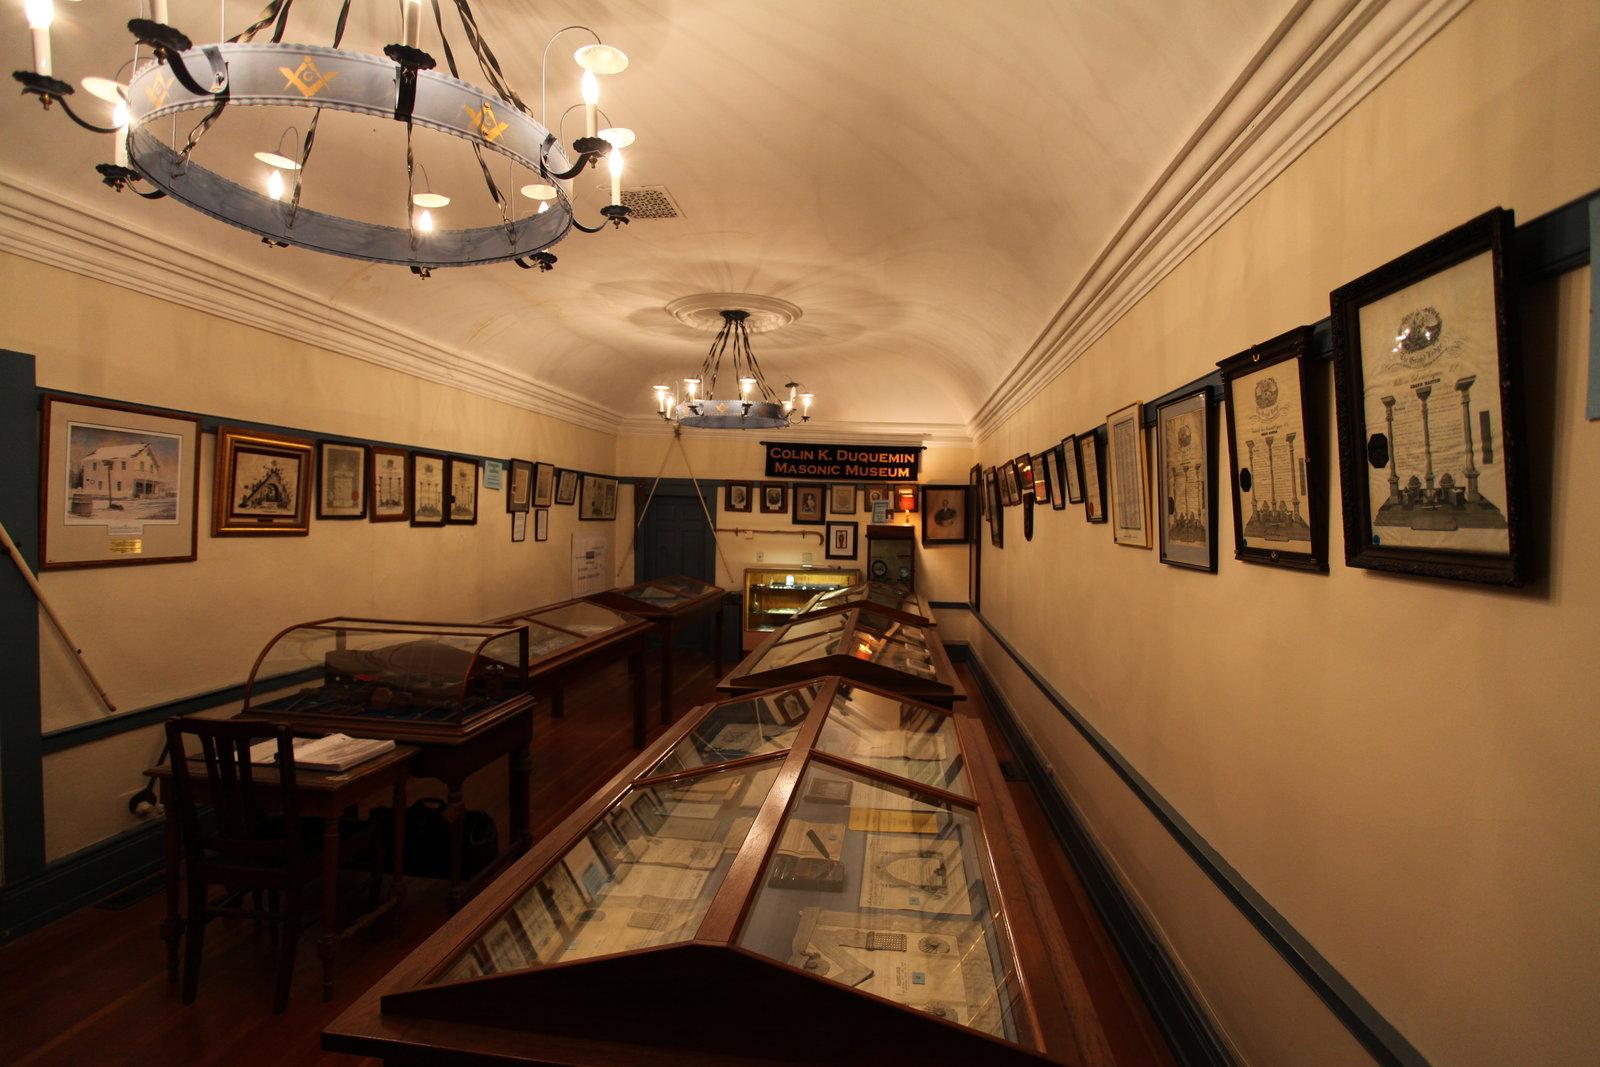 Colin K. Duquemin Masonic Museum